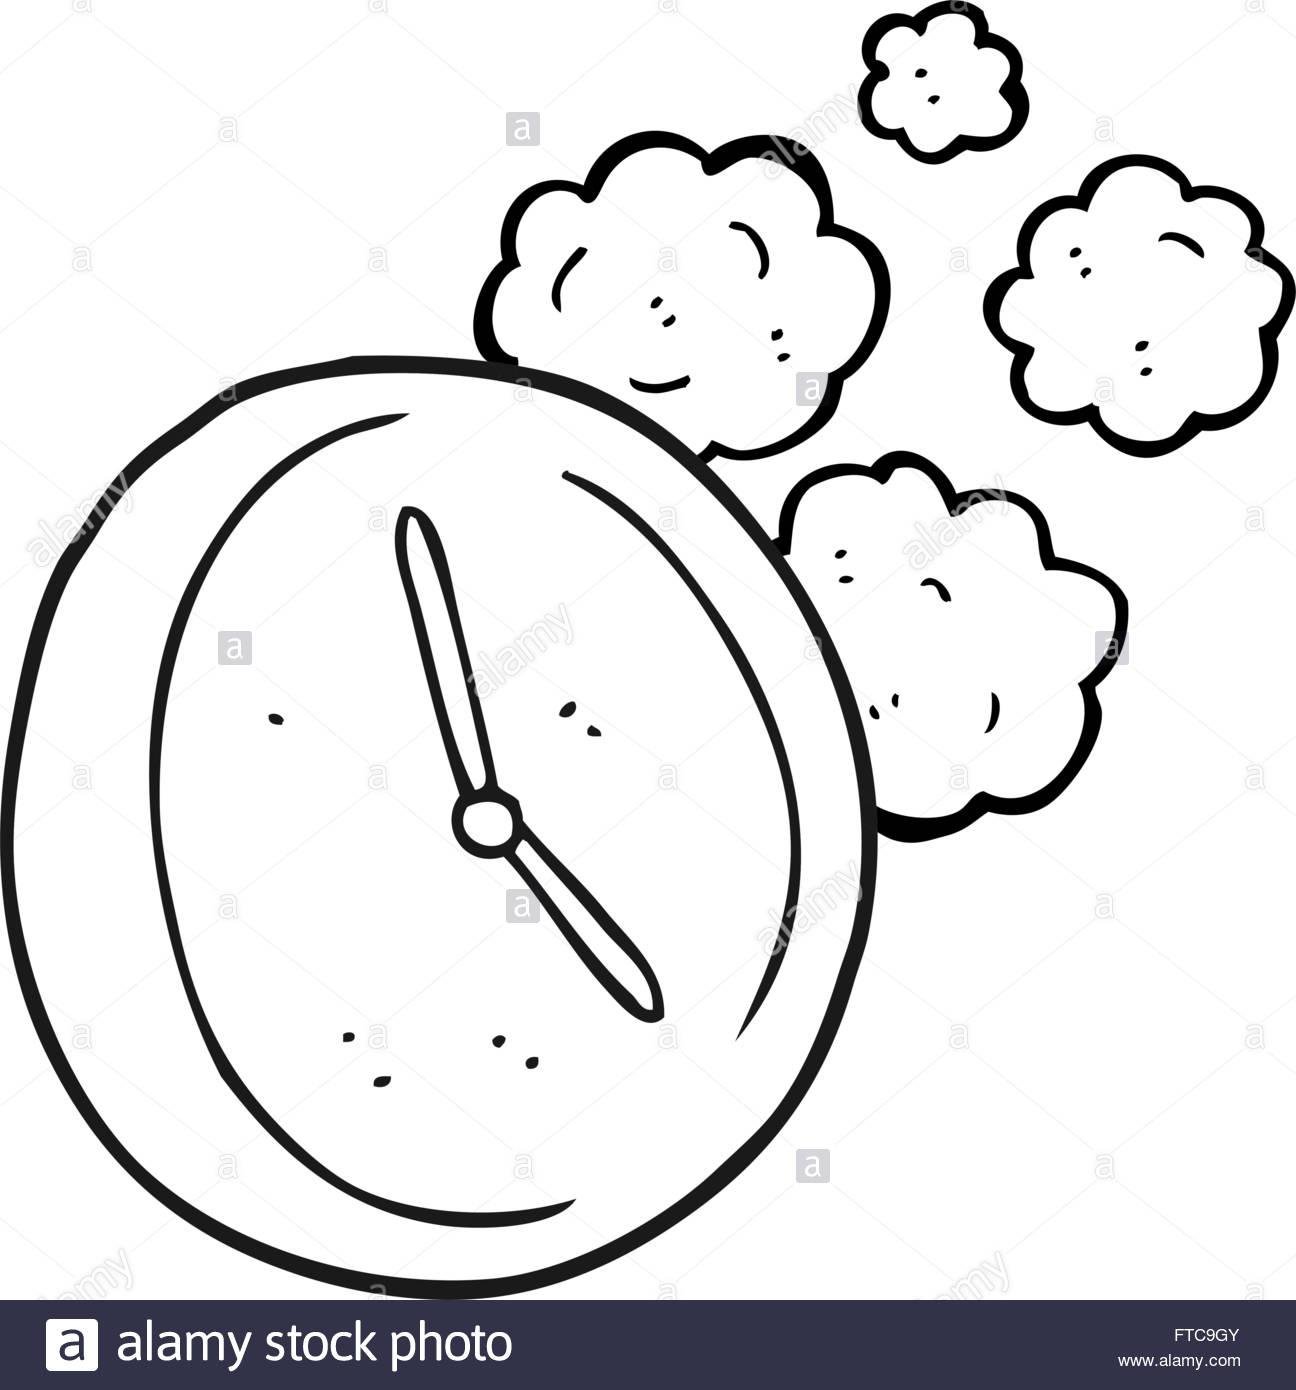 1296x1390 Drawn Clock Black And White